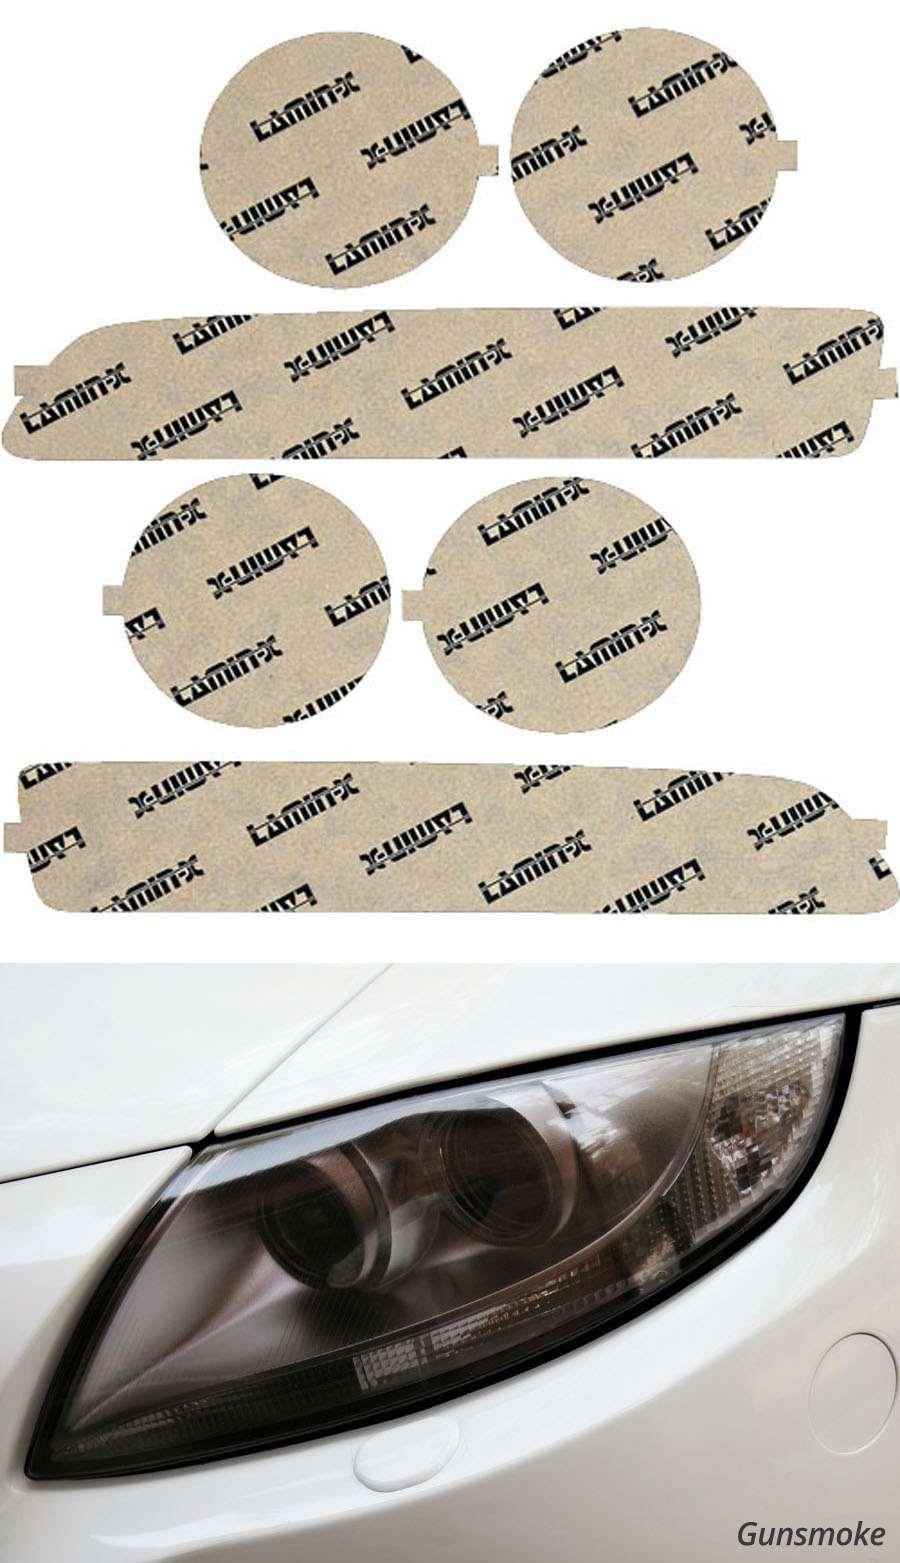 Acura Integra 94-97 Gunsmoke Headlight Covers Lamin-X